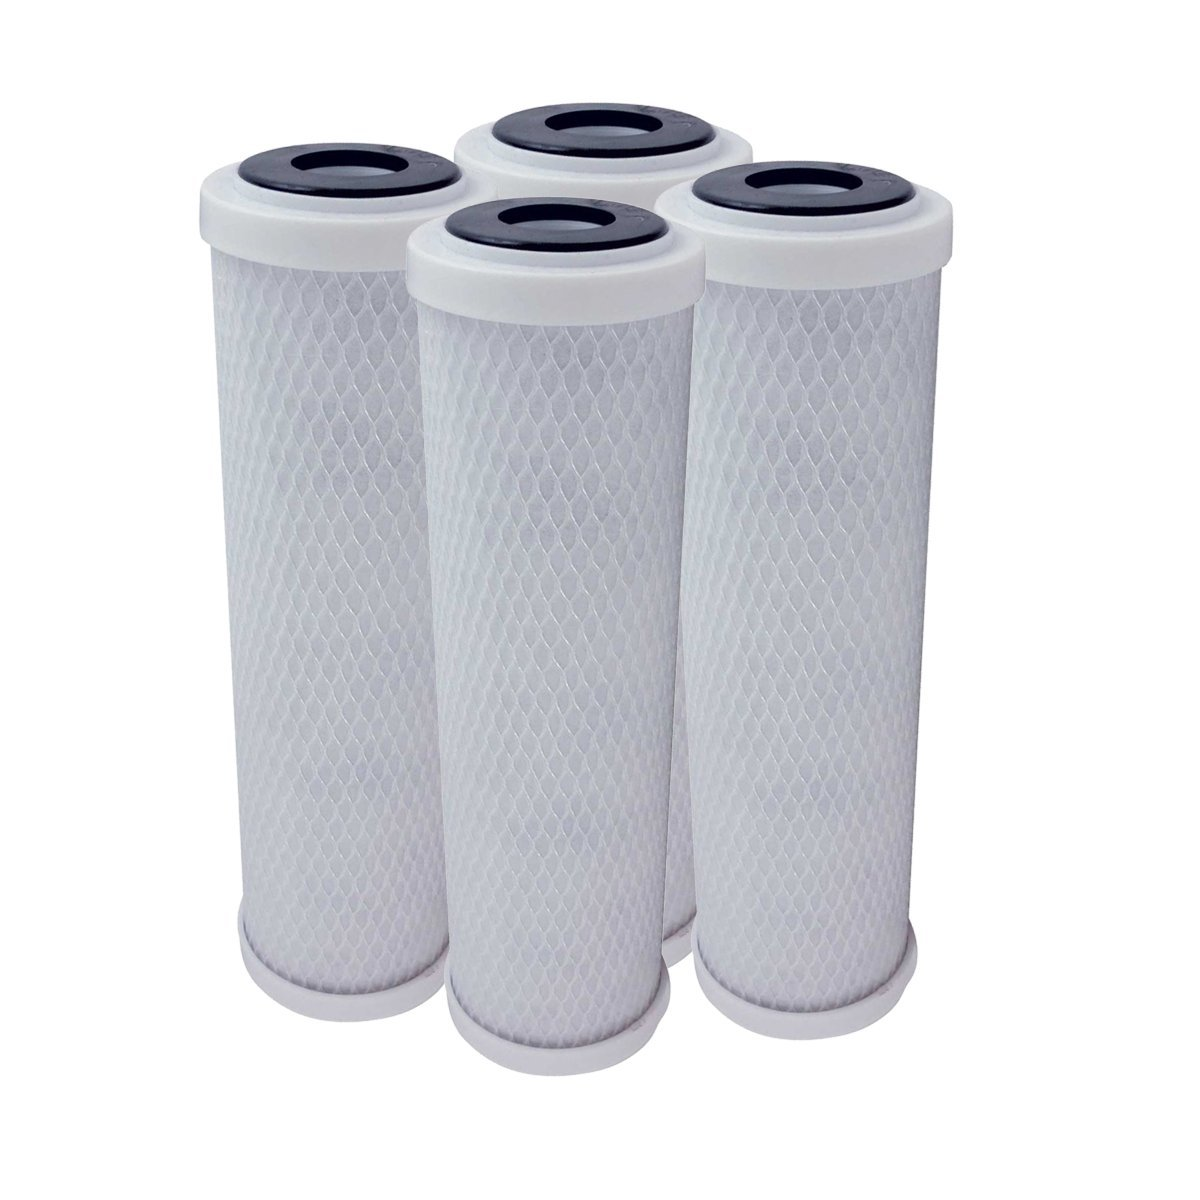 Millennium-Filters MW-12-32-50K-10-pack 12-32-50K Headline Pneumatic Compressed Air Filter Element Direct Interchange Pack of 10 White